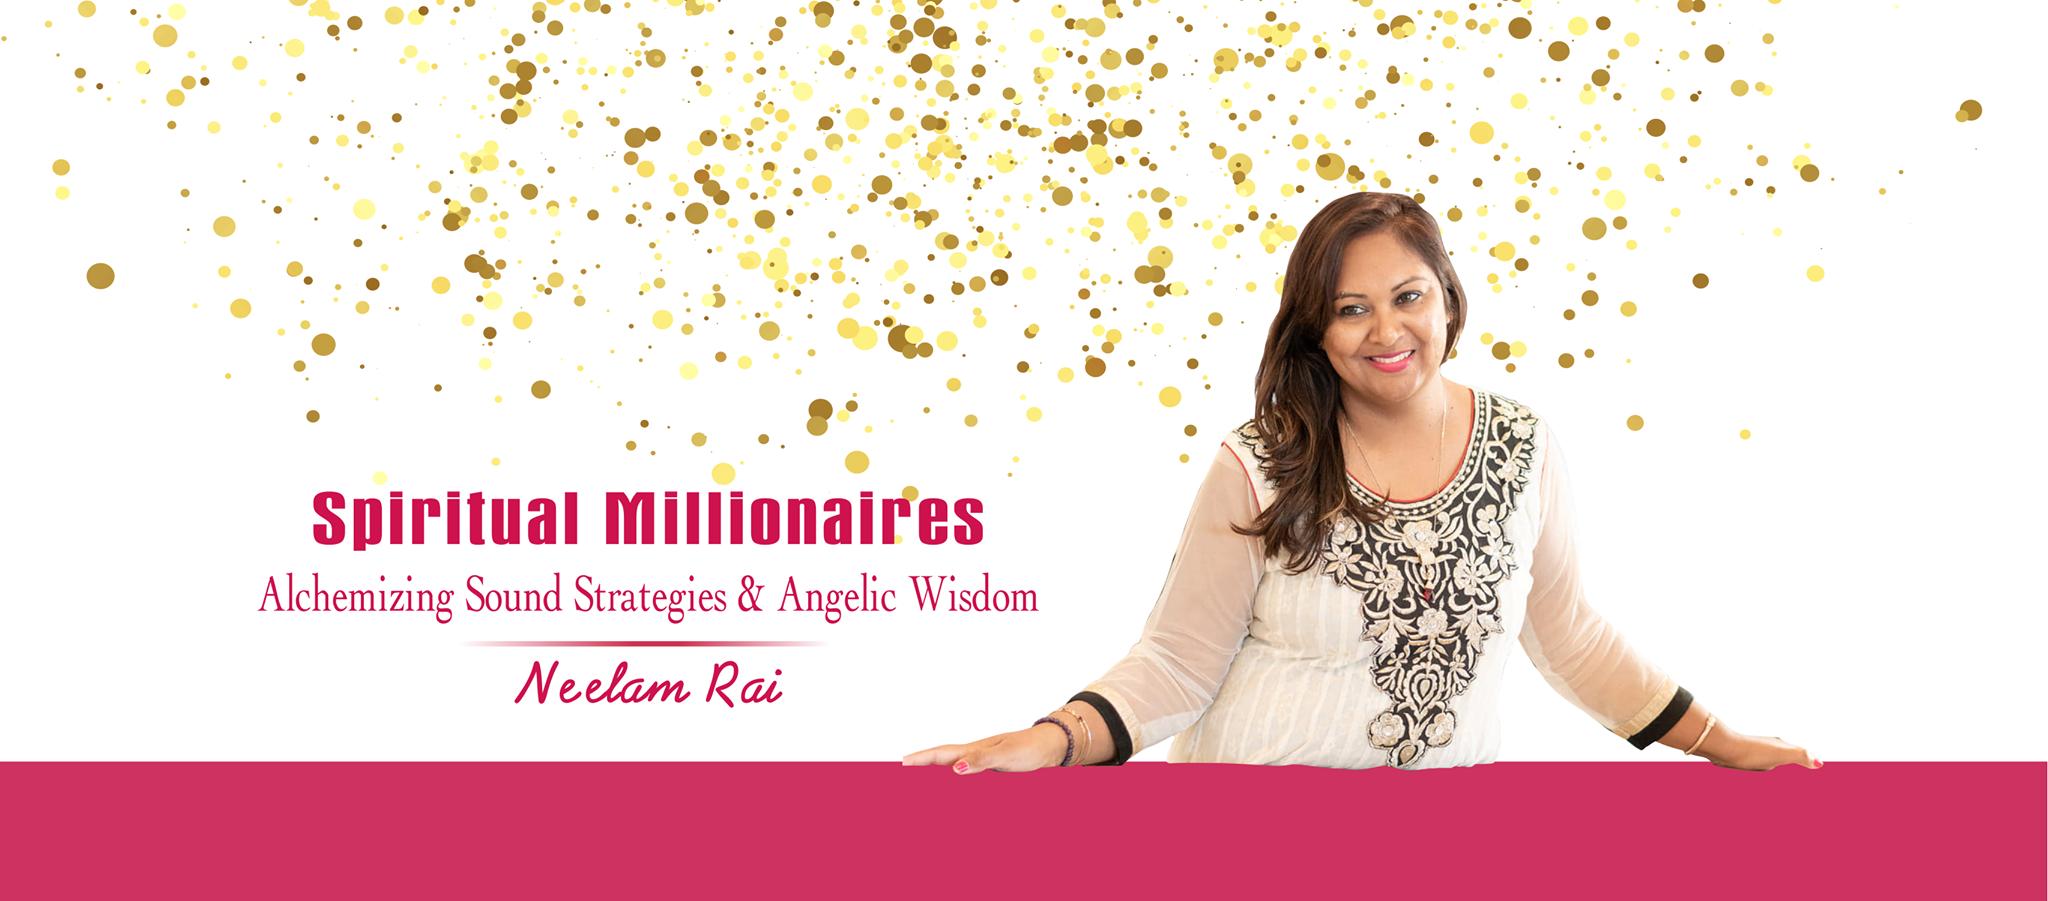 Spiritual Millionaires